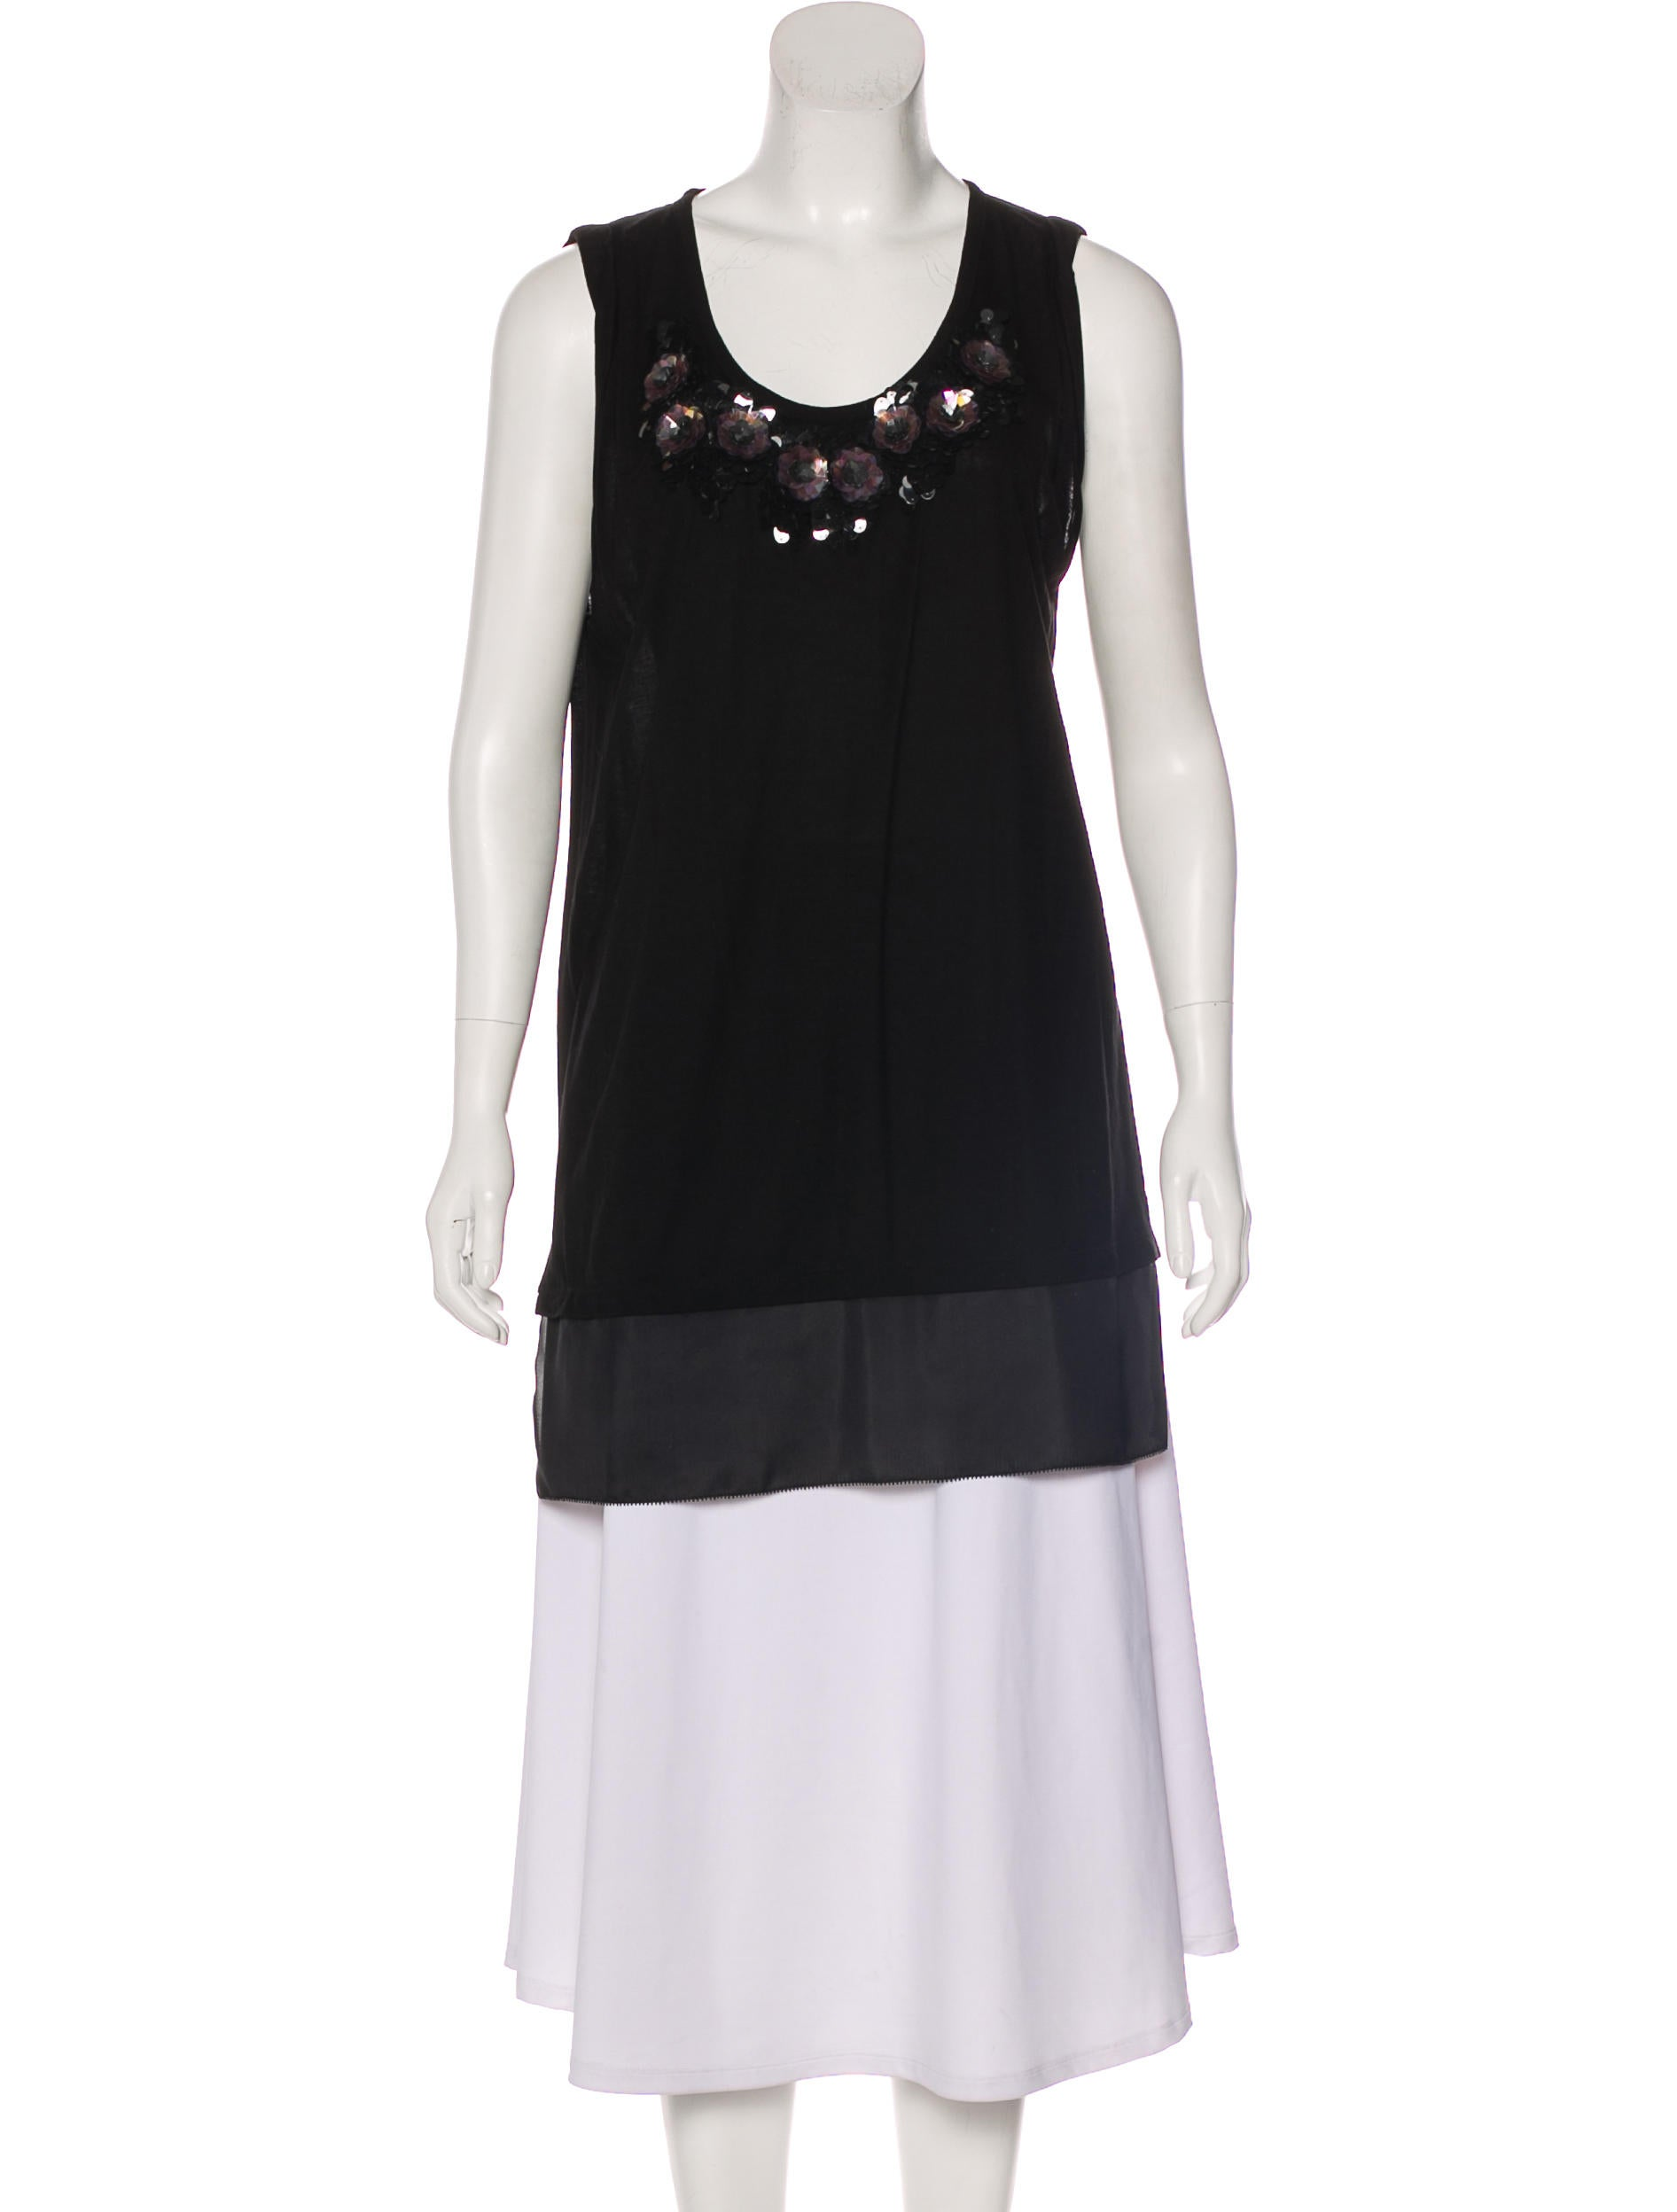 Ver30104The Clothing Tunic Wang Sleeveless Vera Embellished 3LAj45R